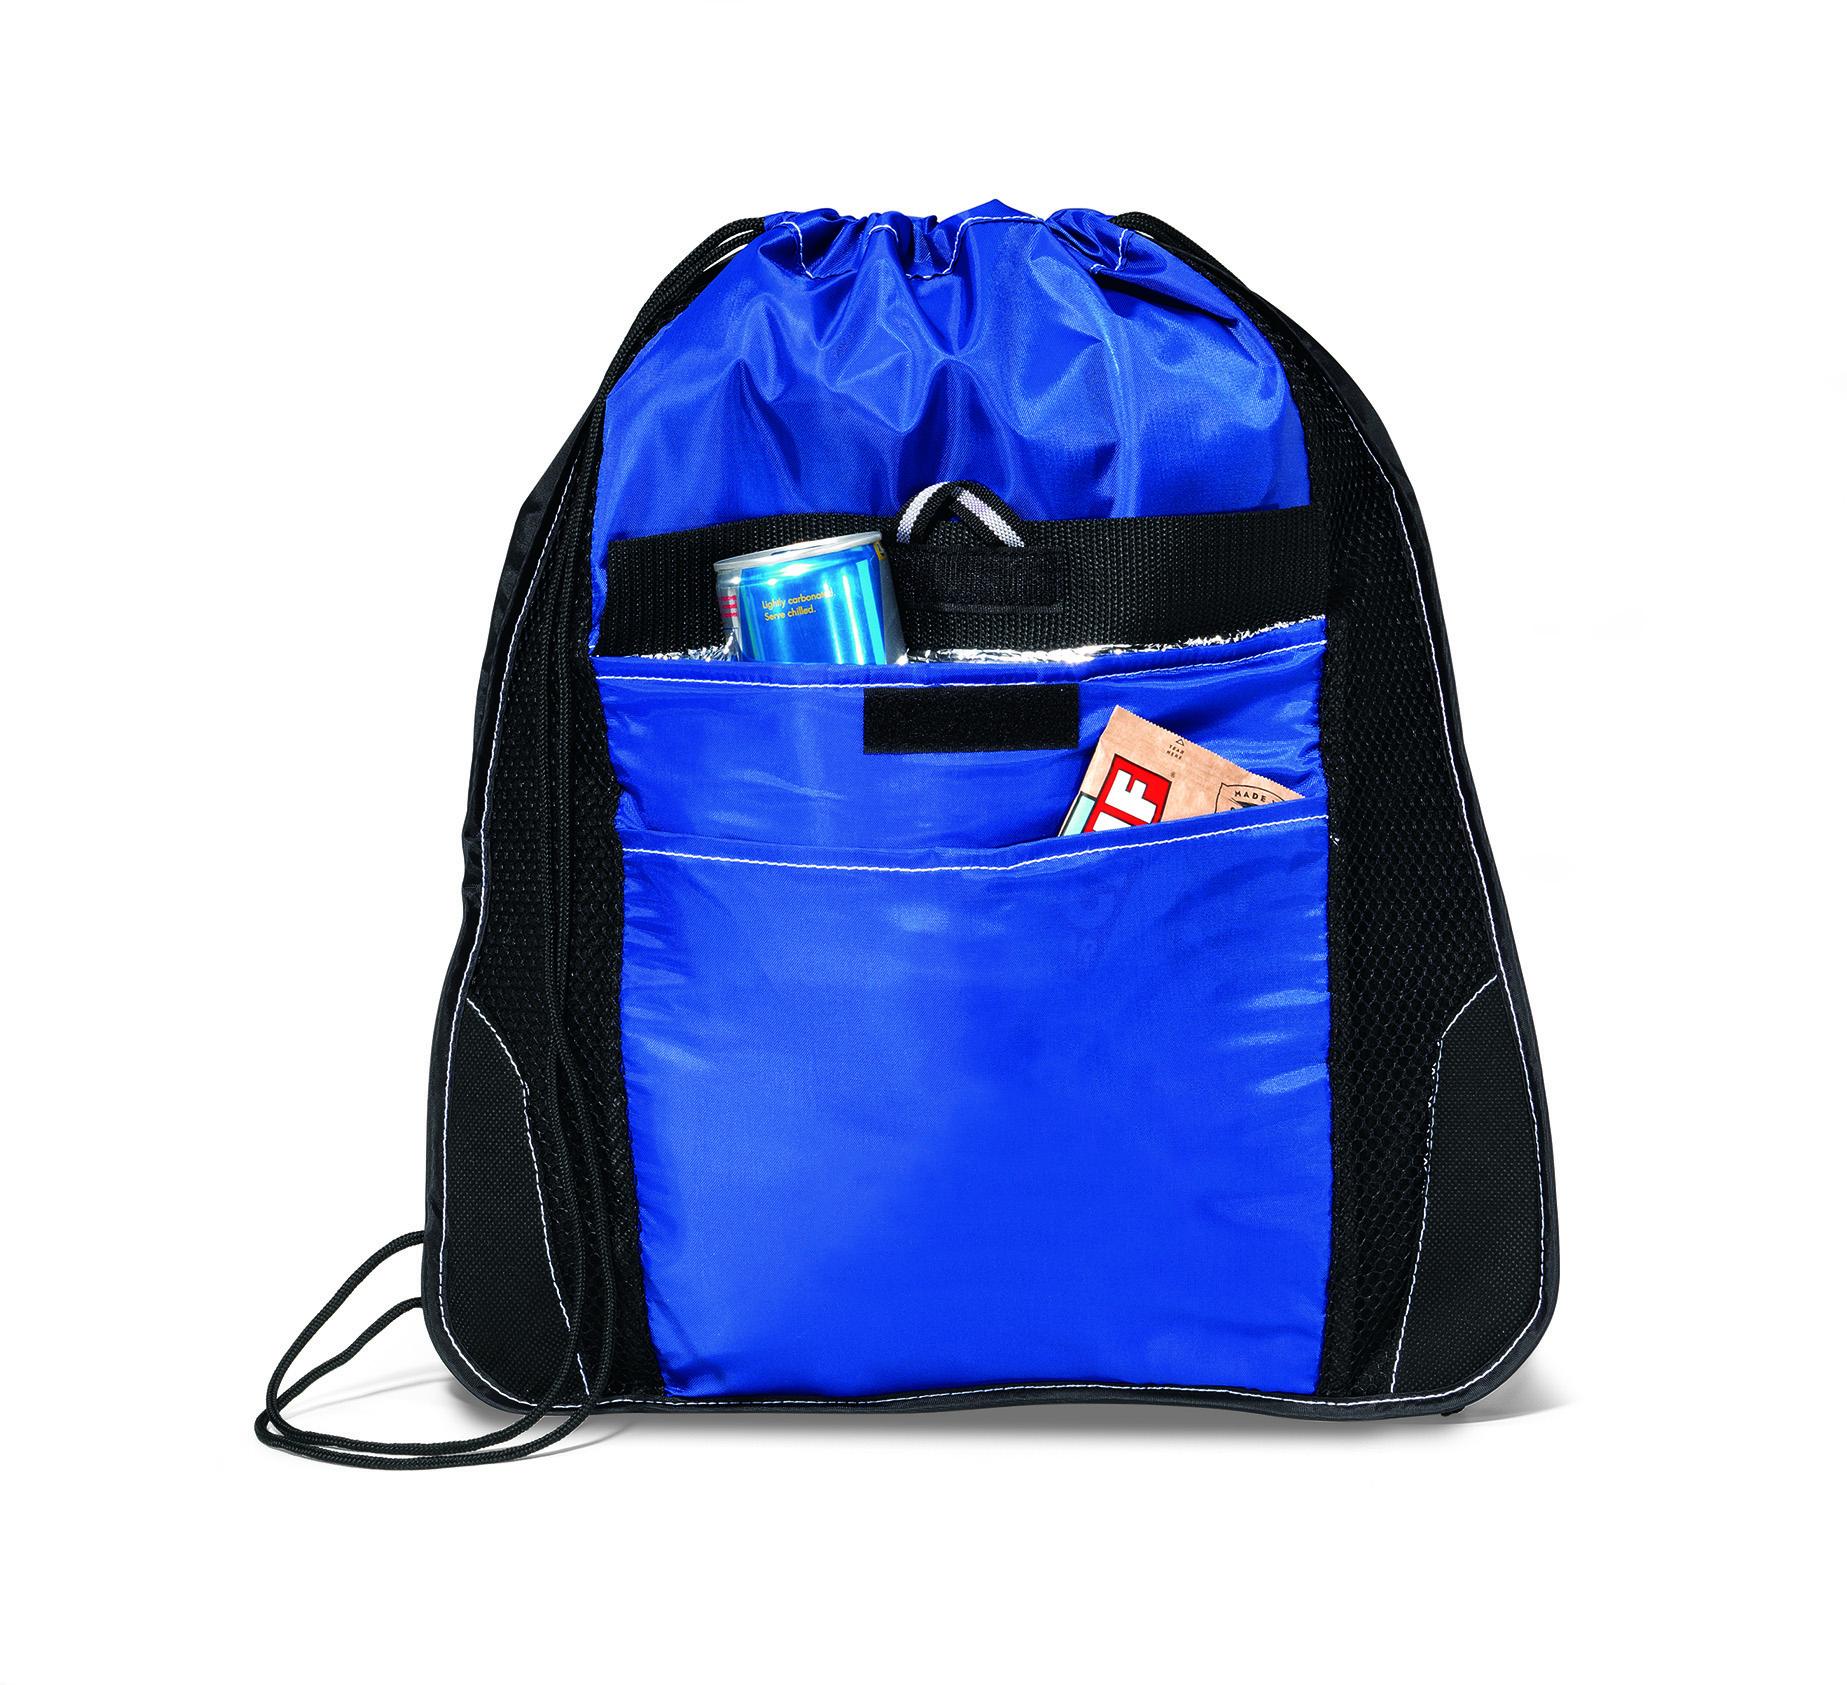 Gemline 4075 - Elite Sport Cinchpack with Insulated Pocket